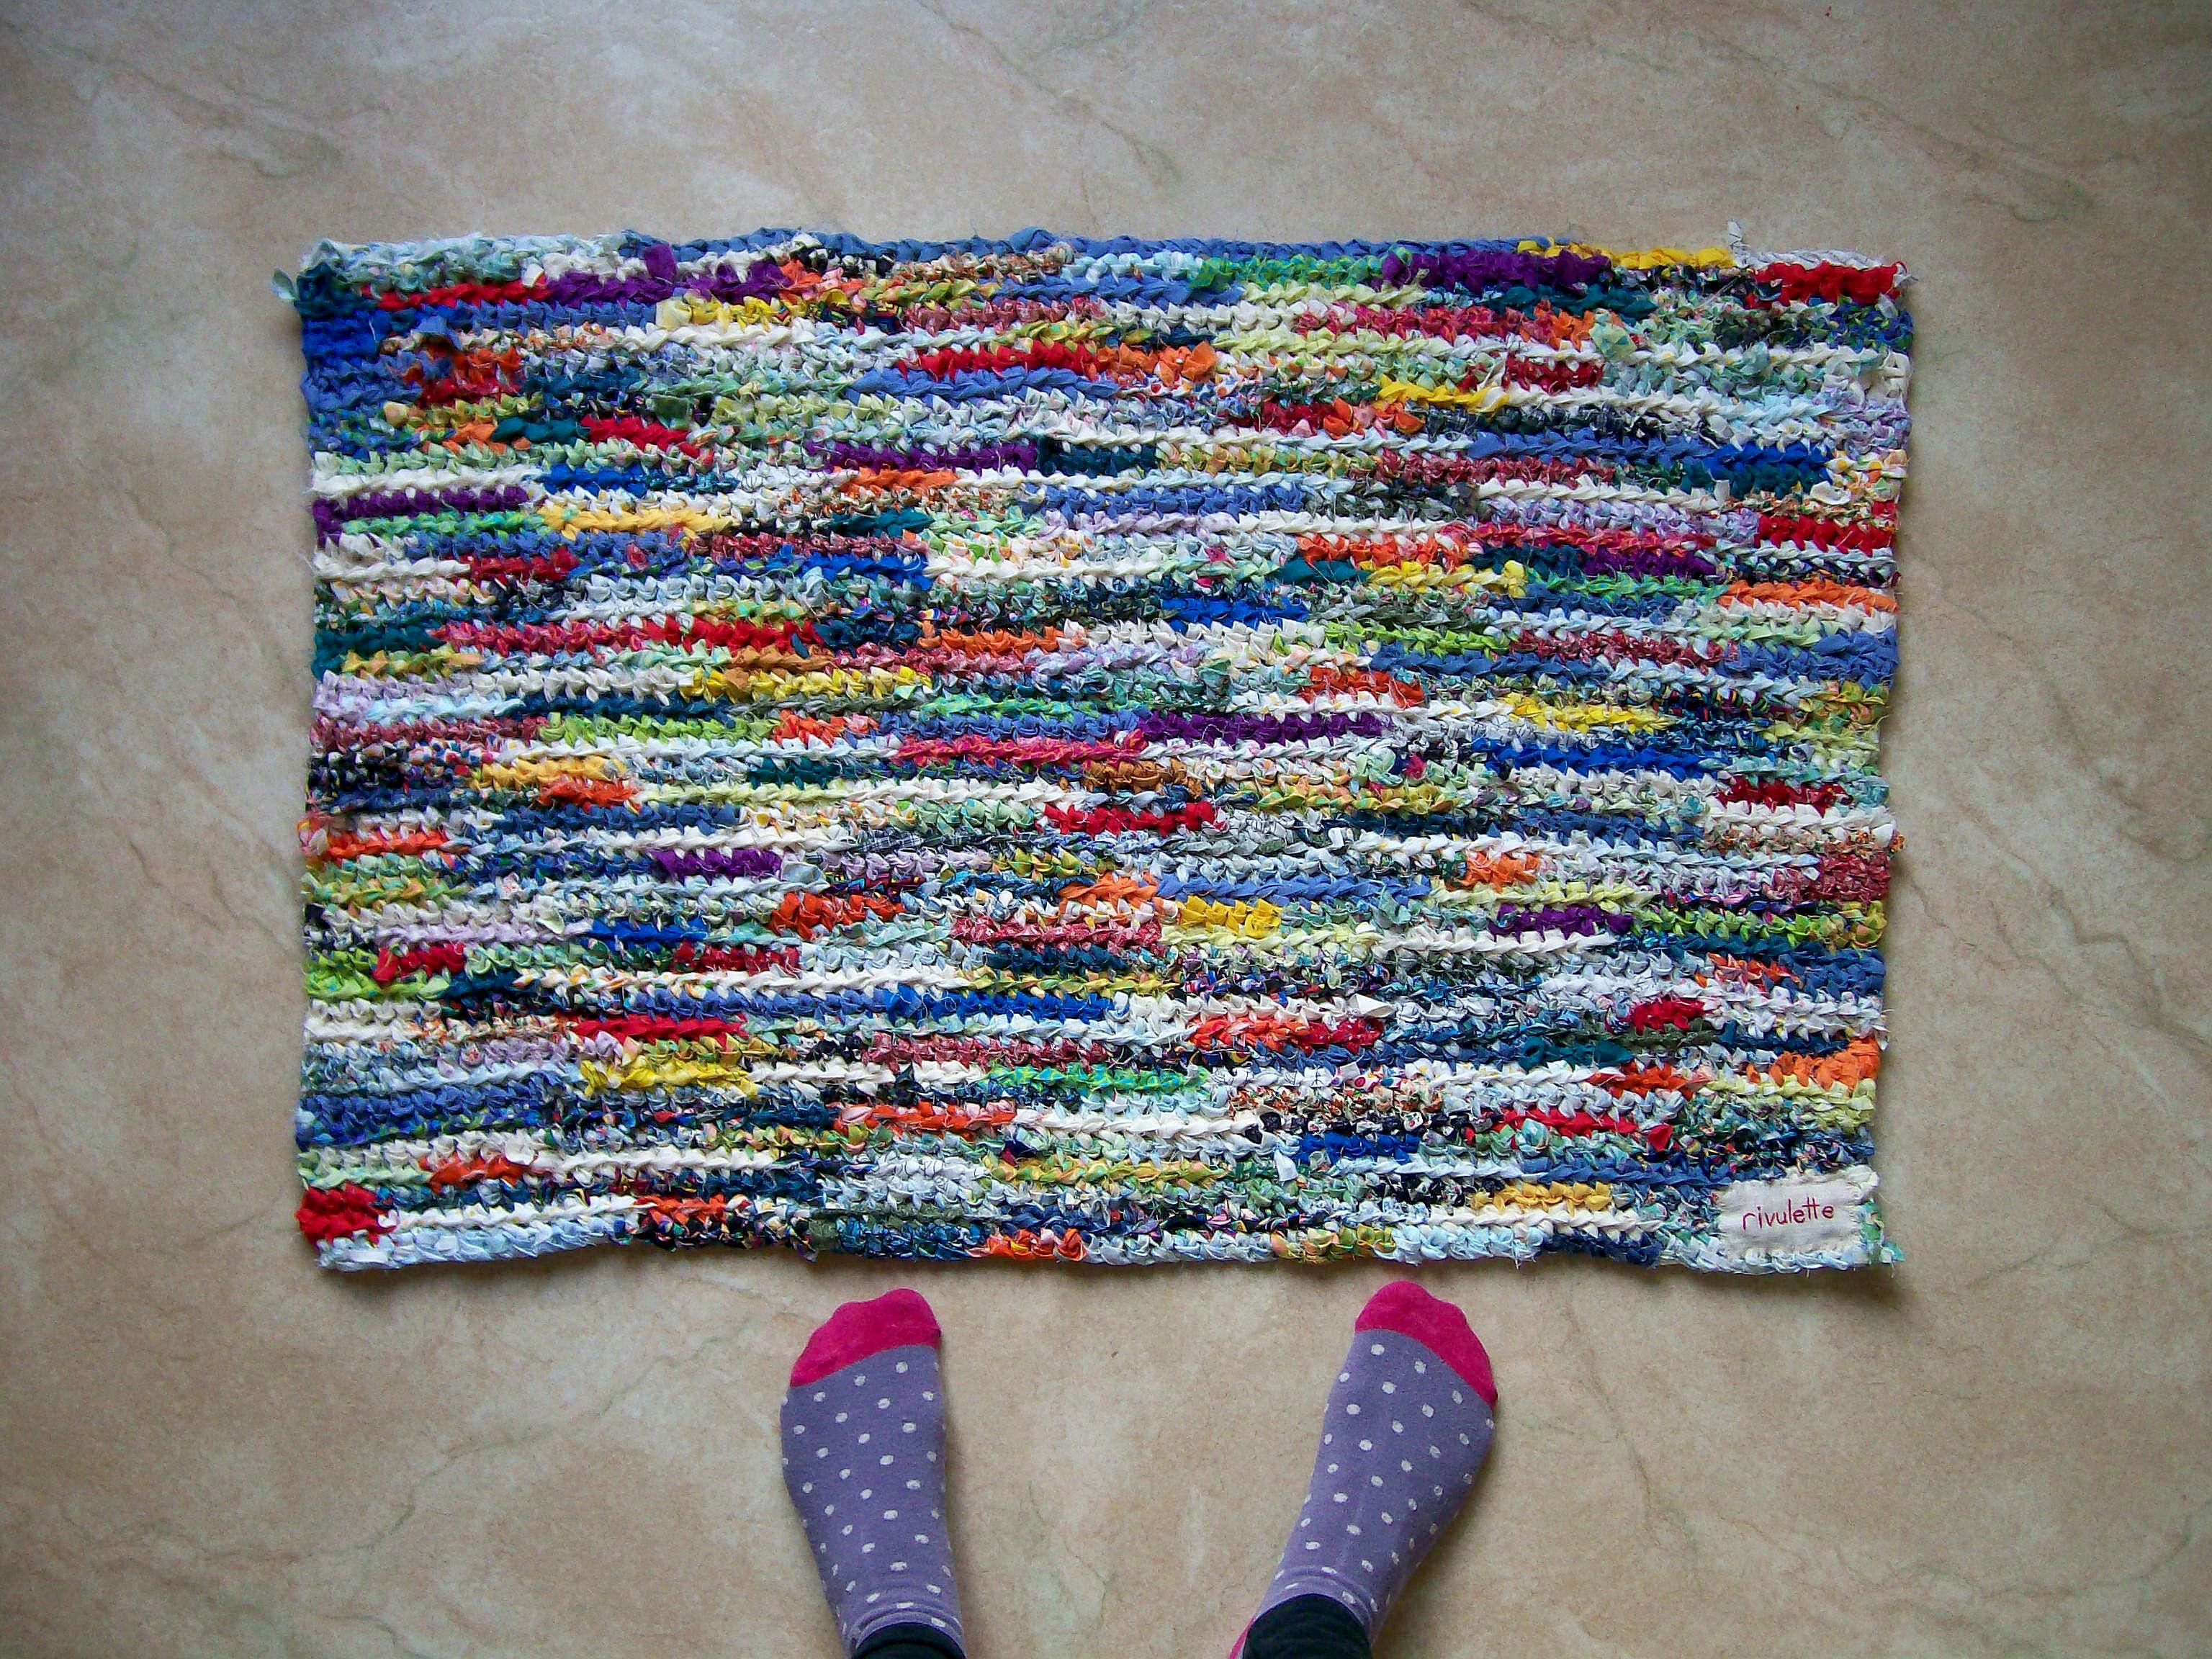 Rainbow Fabric Strip Rag Rug Rag Rug Fabric Strips Handmade Crochet